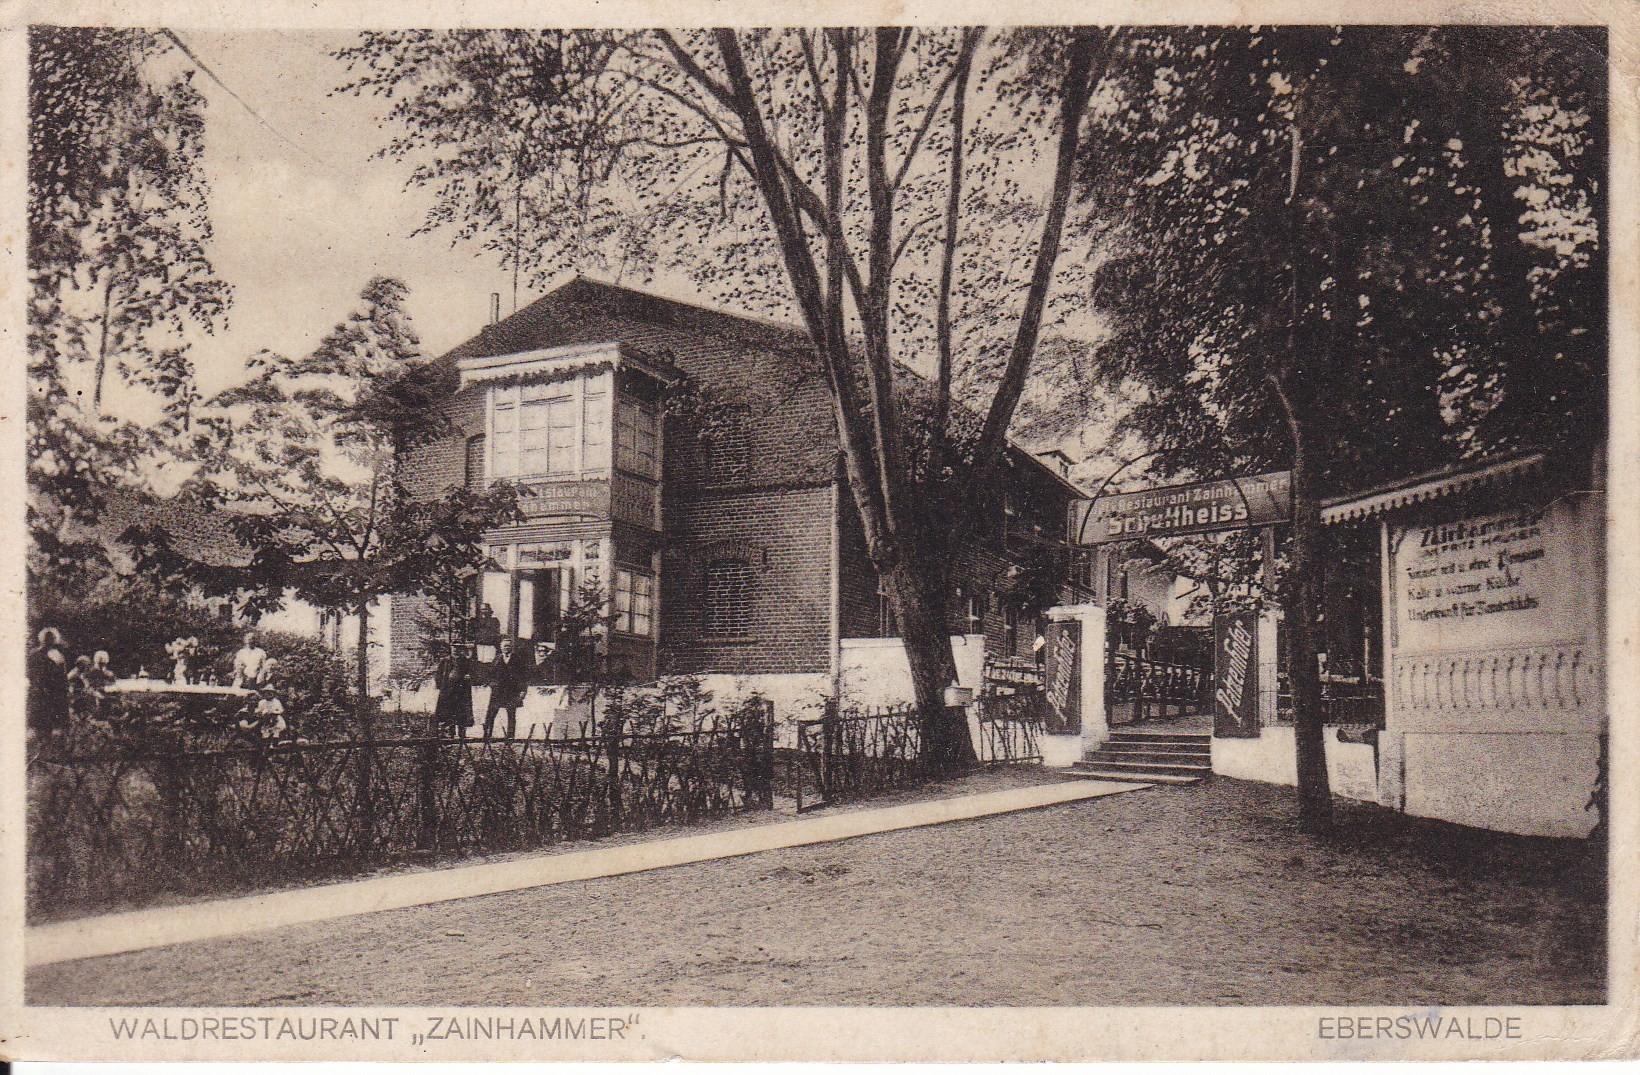 The 'Restaurant Zainhammer' in Eberswalde in 1930, postcard (Christina Wühle Collection, Eberswalde, RR-F)